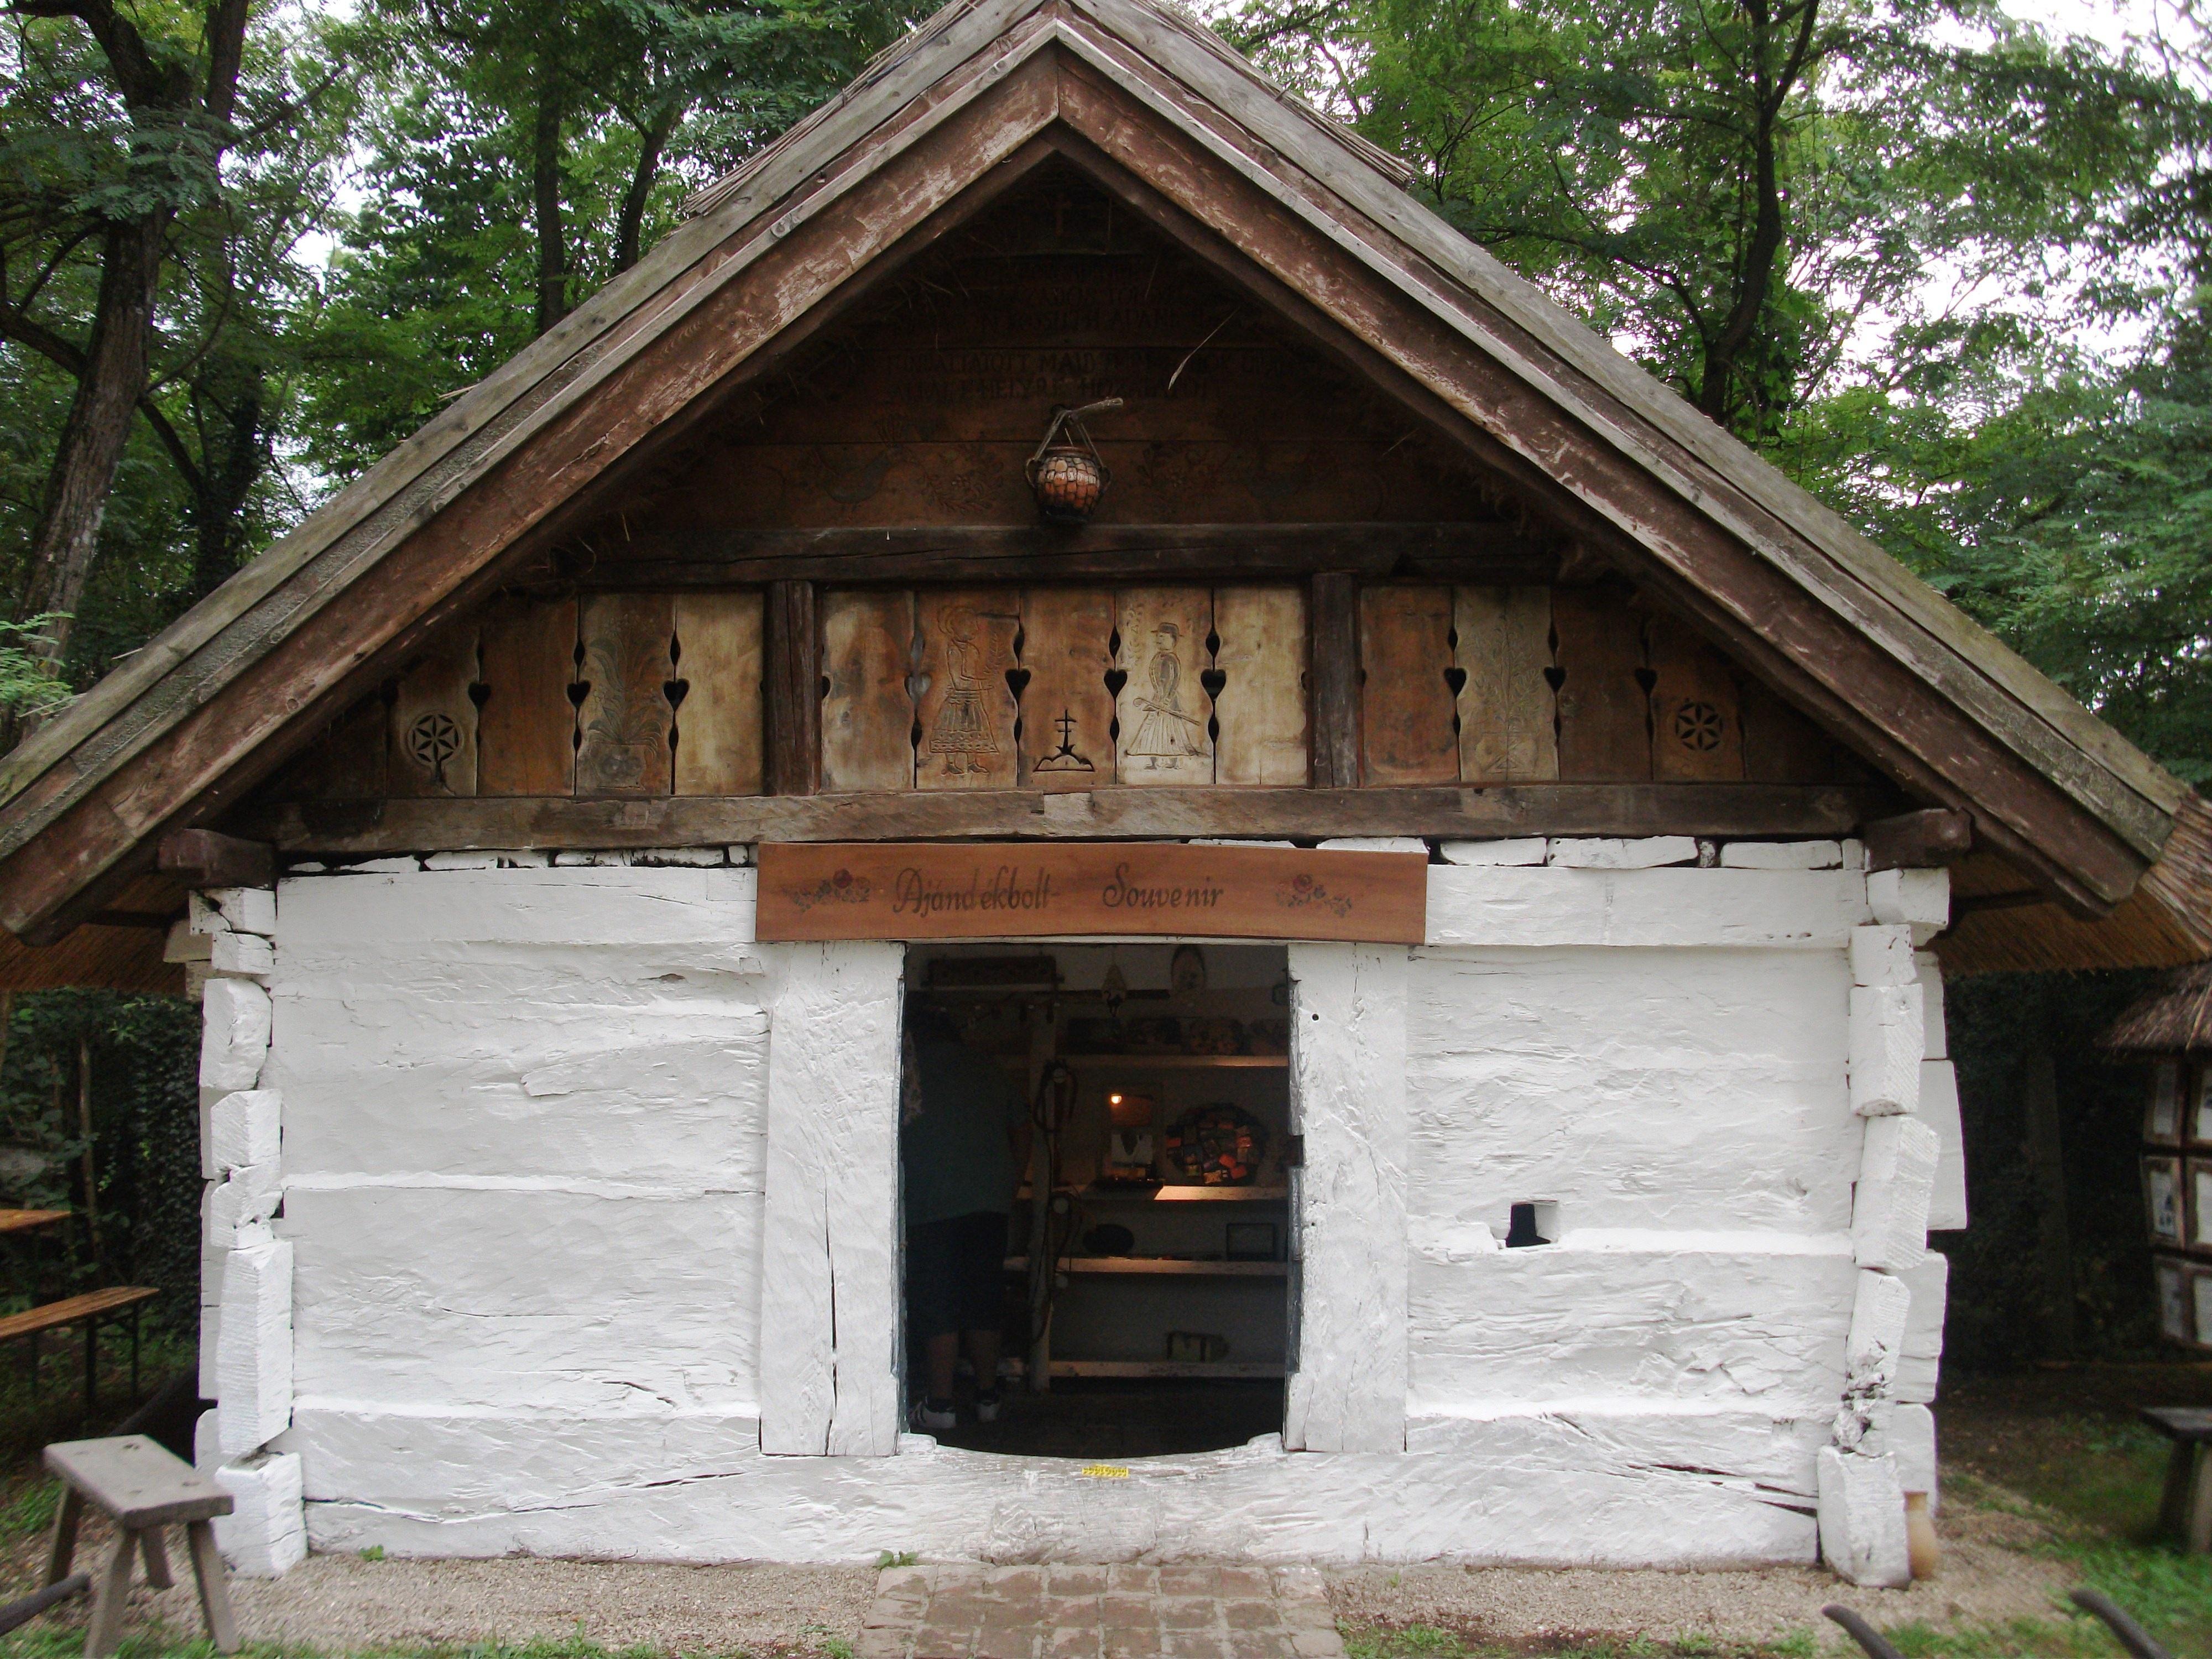 Fotos gratis : edificio, granero, cobertizo, rústico, choza ...